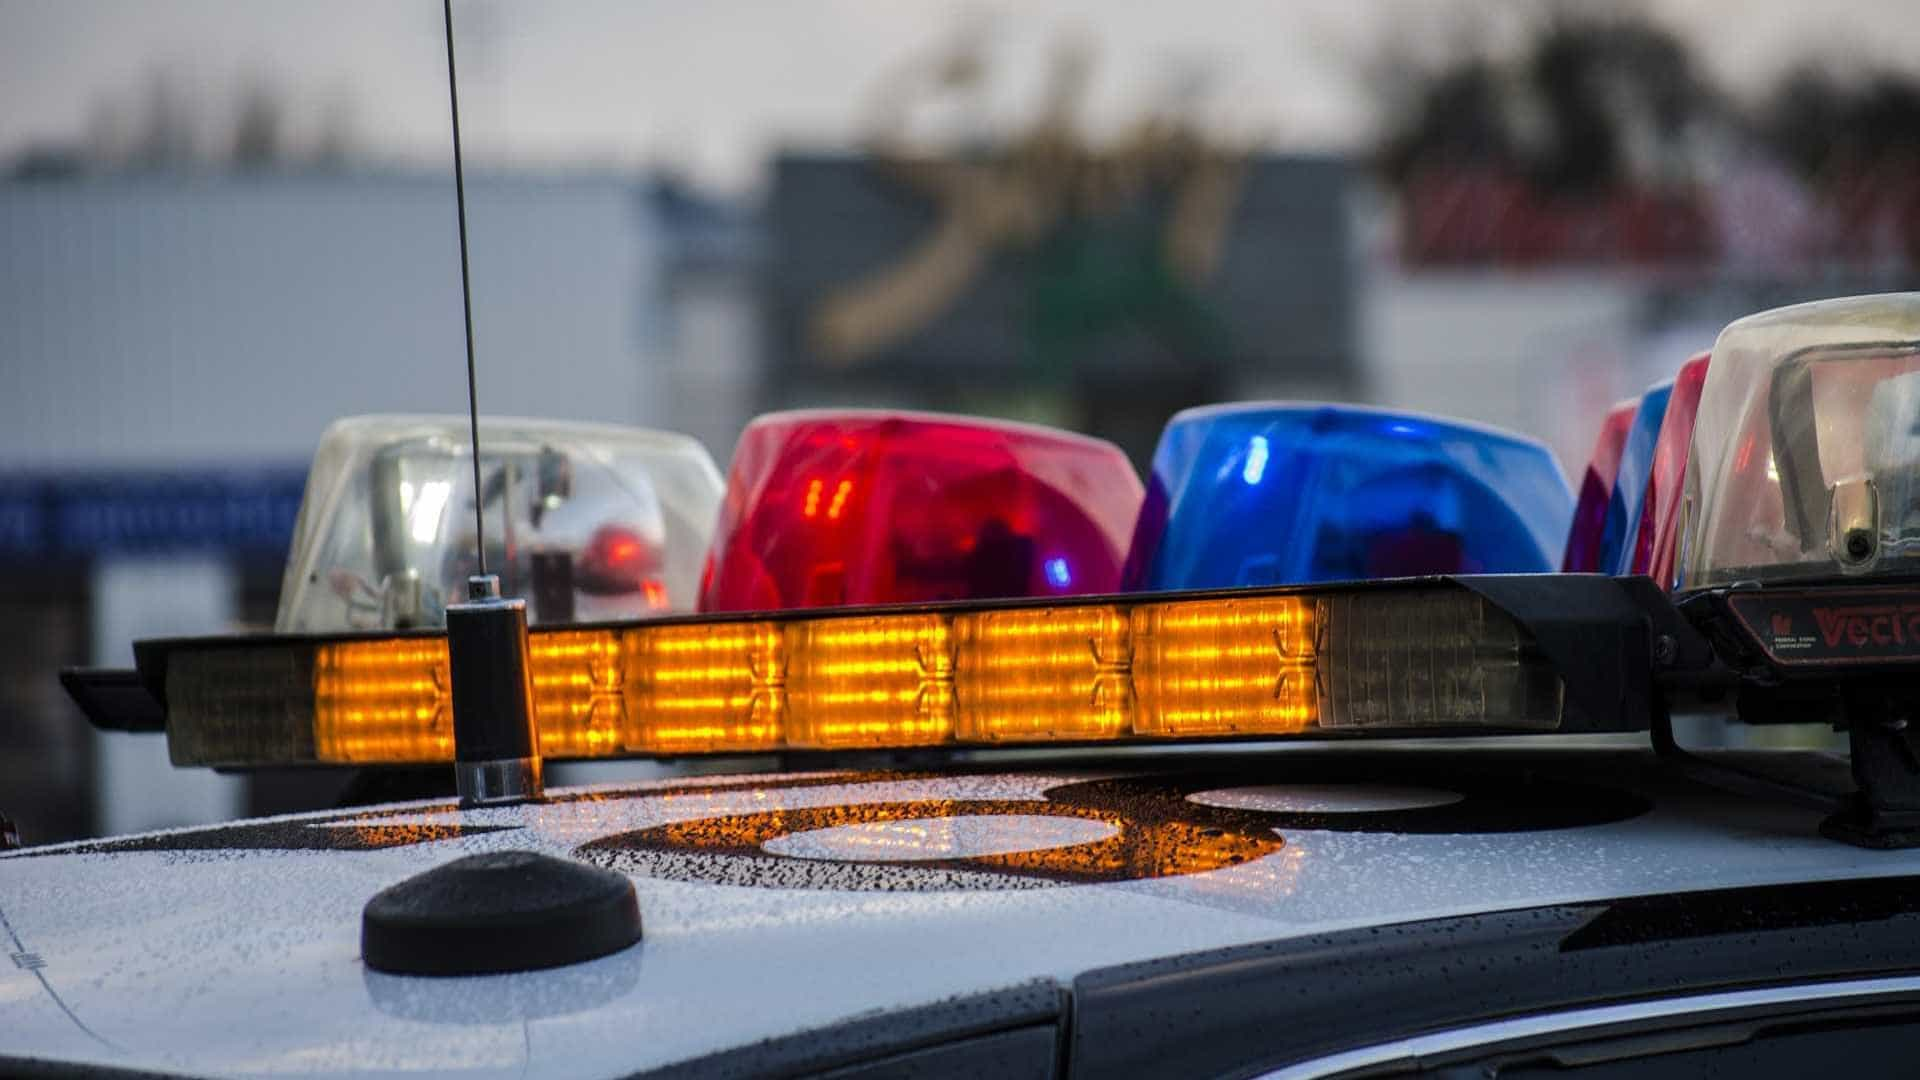 Suspeito de estuprar filha de 4 anos da empregada é preso